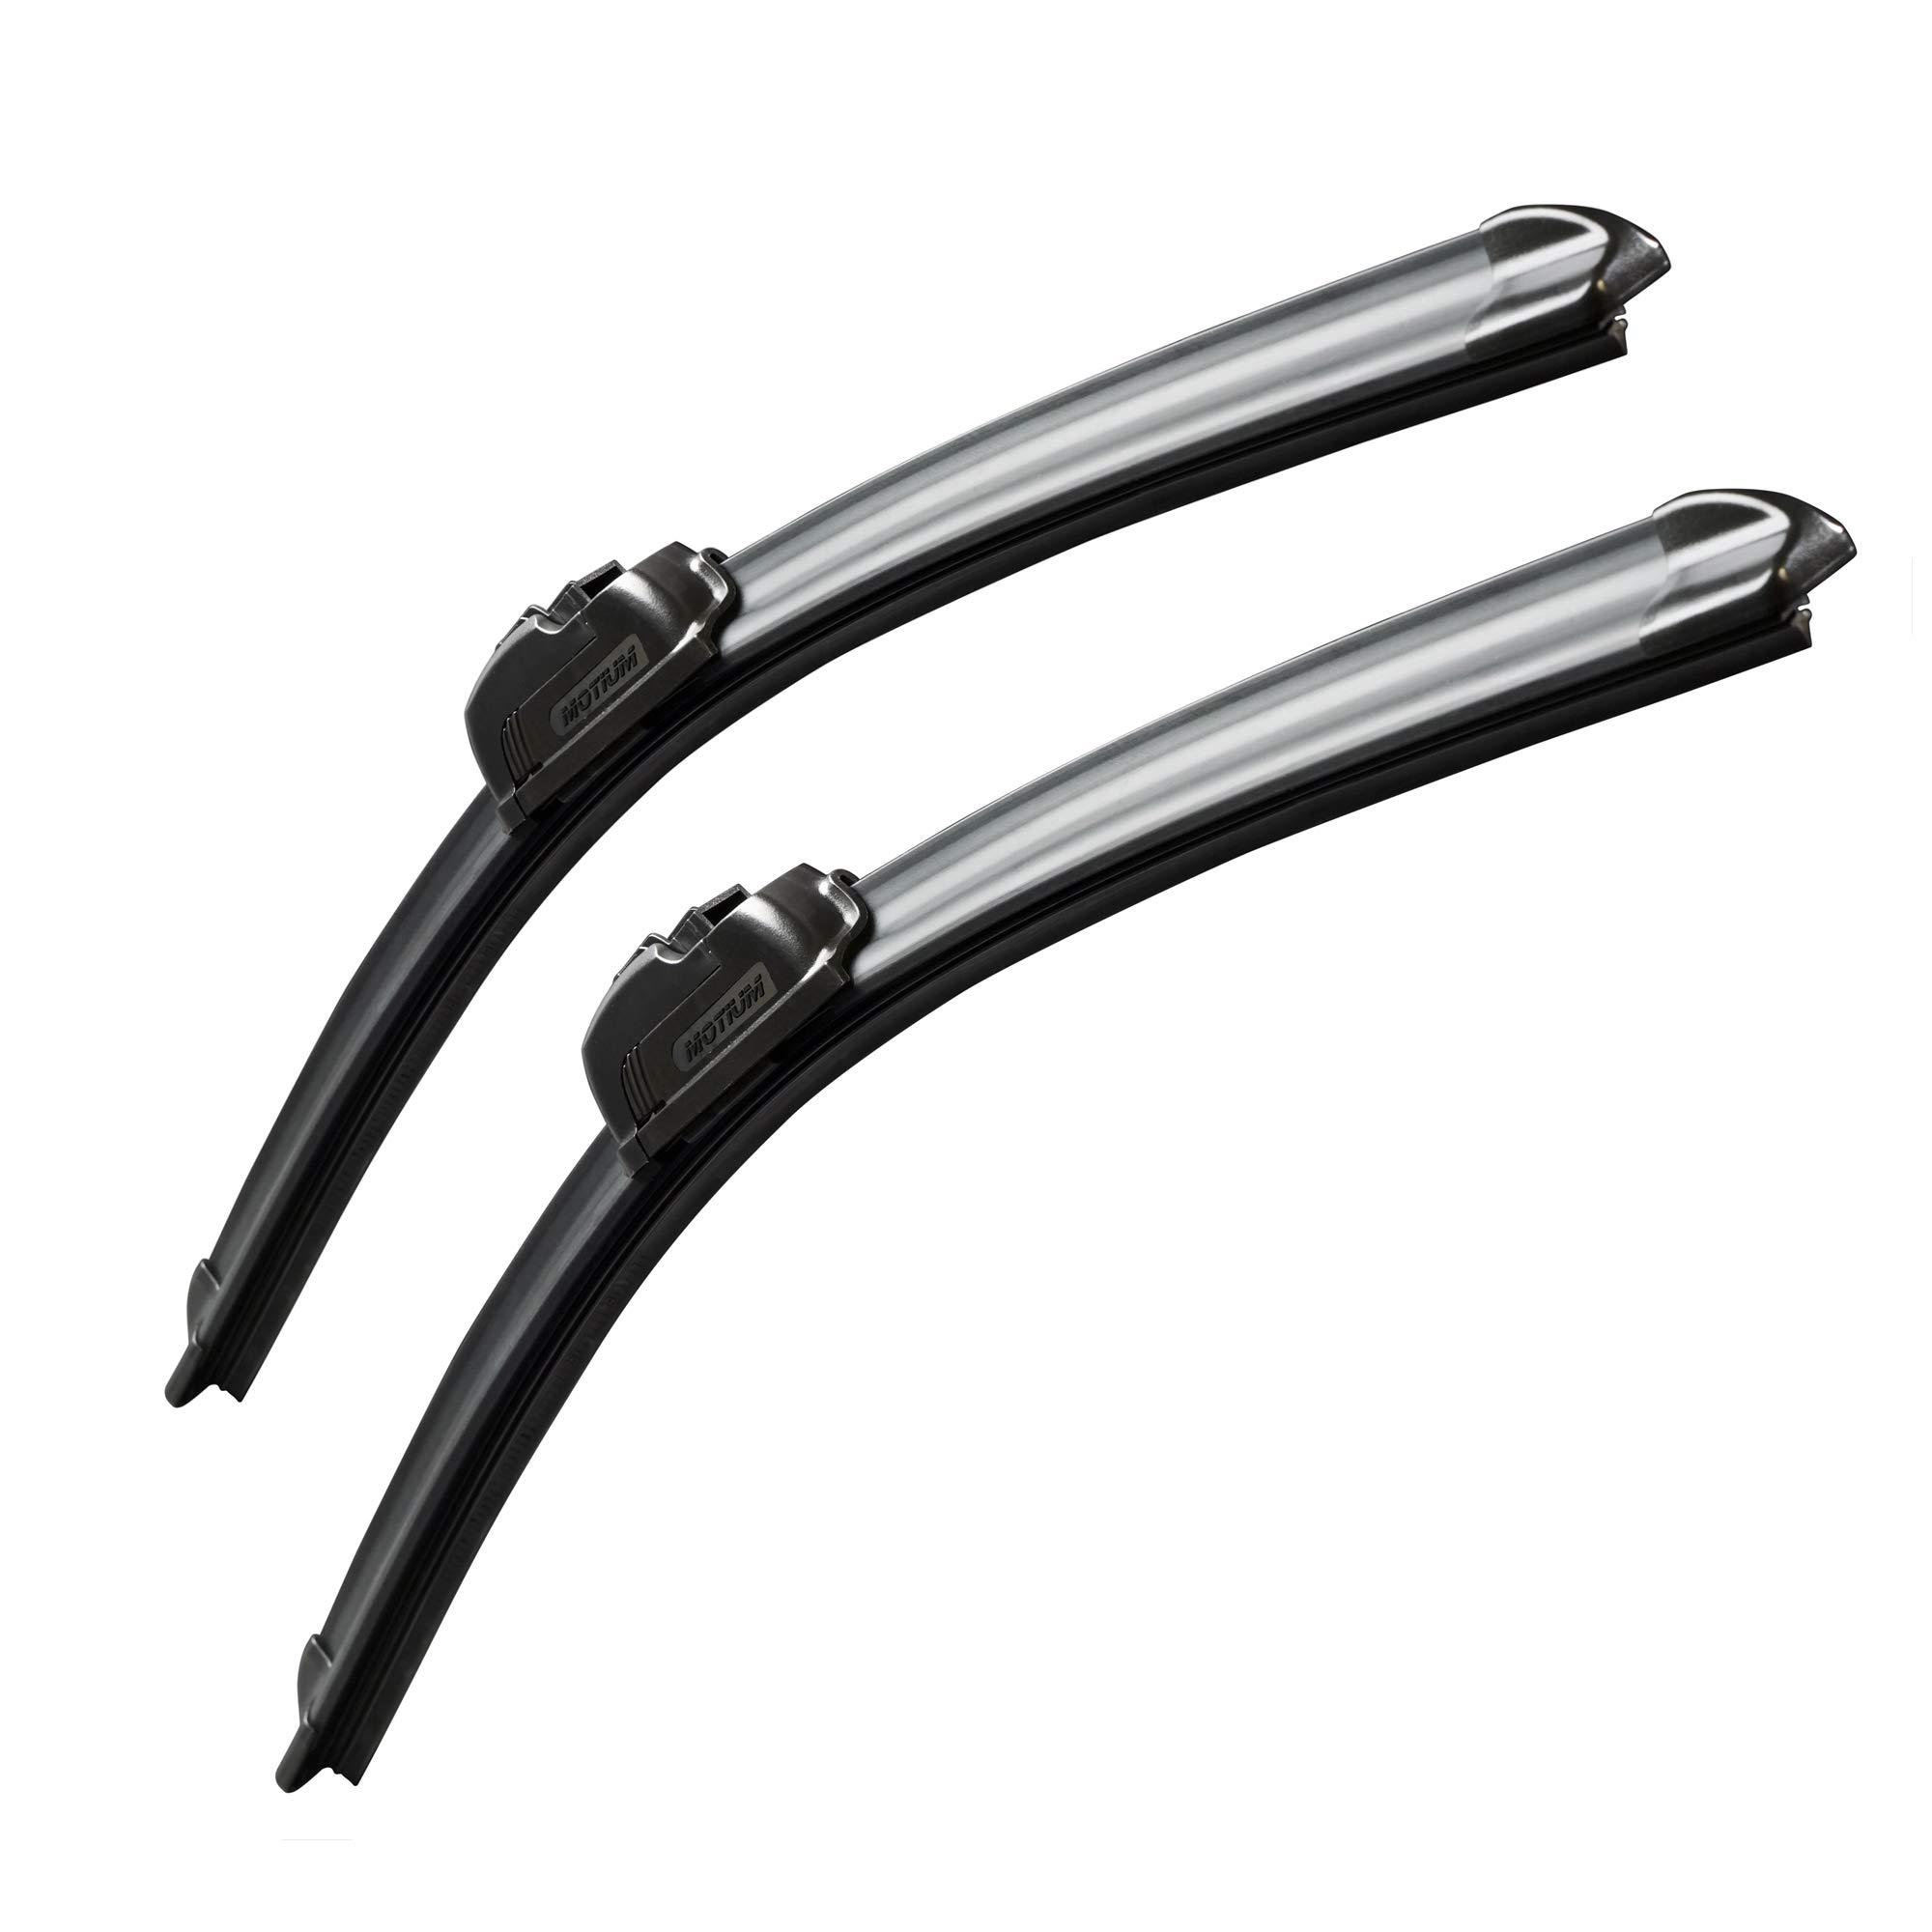 MOTIUM OEM QUALITY 18 + 18 Premium All-Season Windshield Wiper Blades,1 Year Warranty(Set of 2)